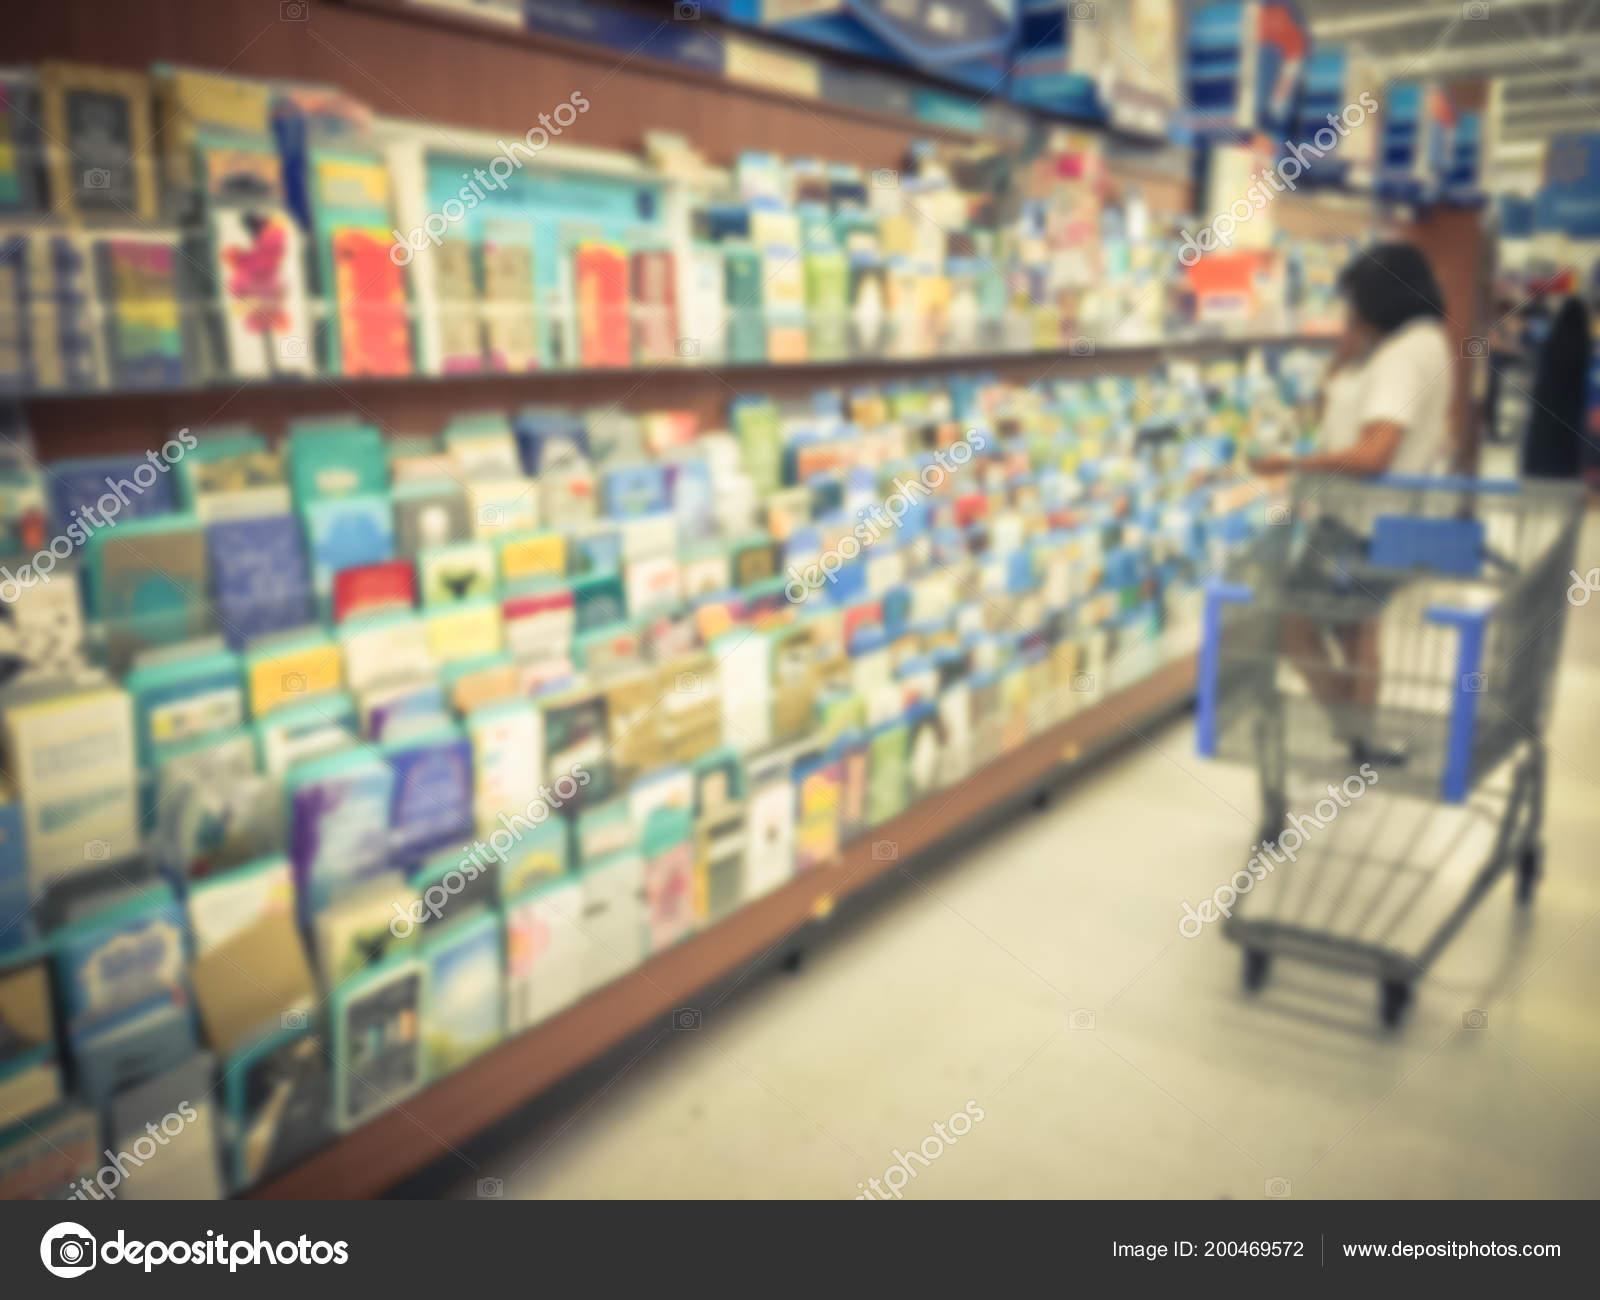 Vintage Blurred Customer Shopping Greeting Cards Retail Store Usa Seasonal Stock Photo